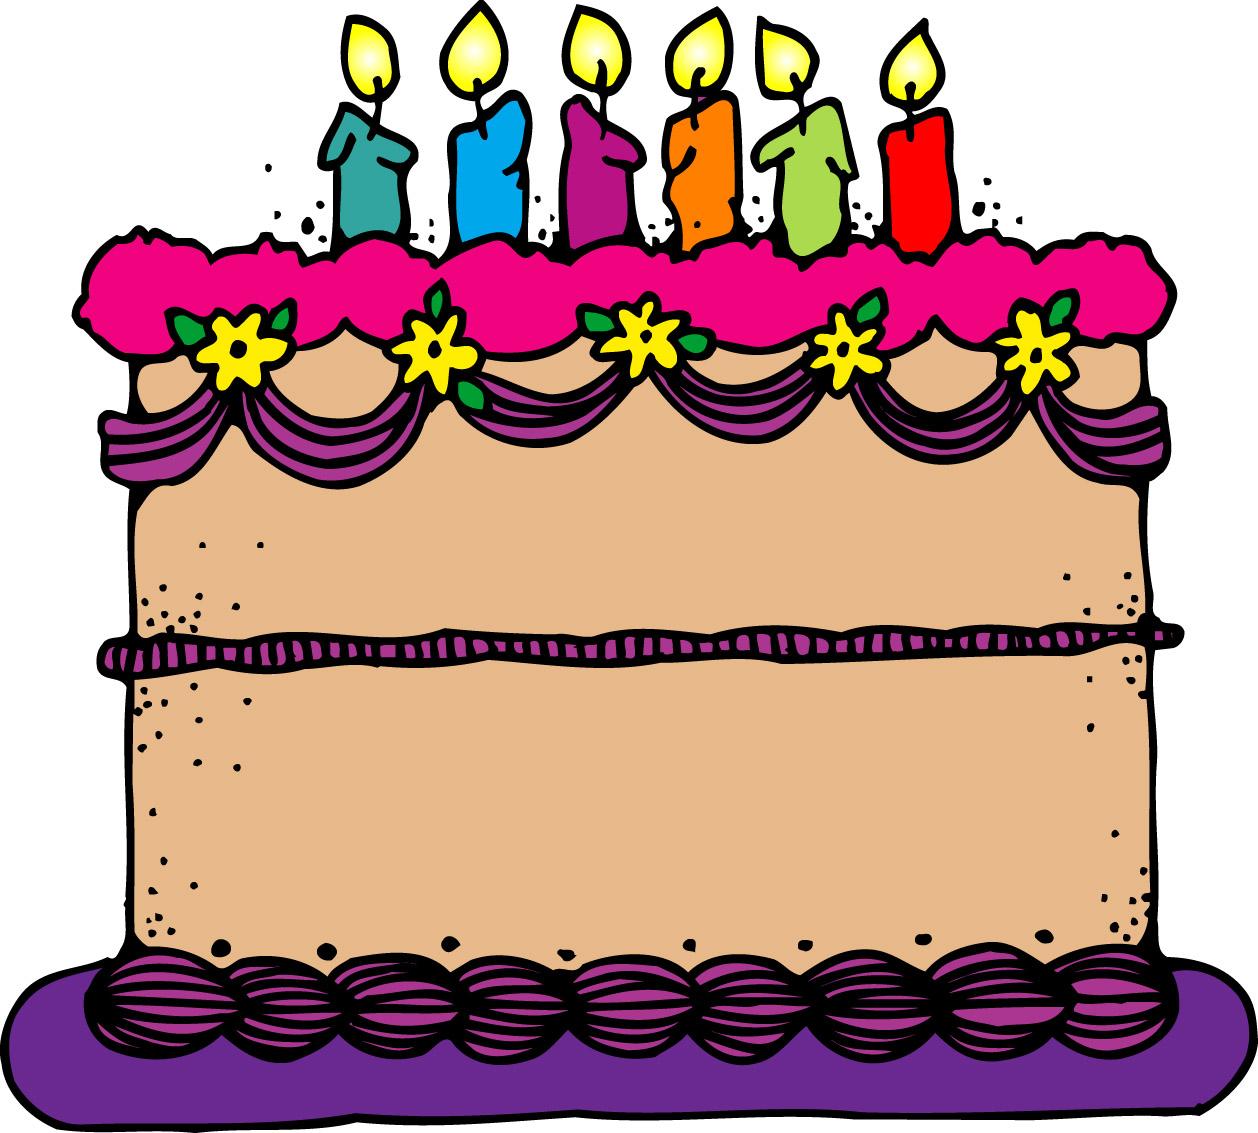 Birthday cake clip art free .-Birthday cake clip art free .-11